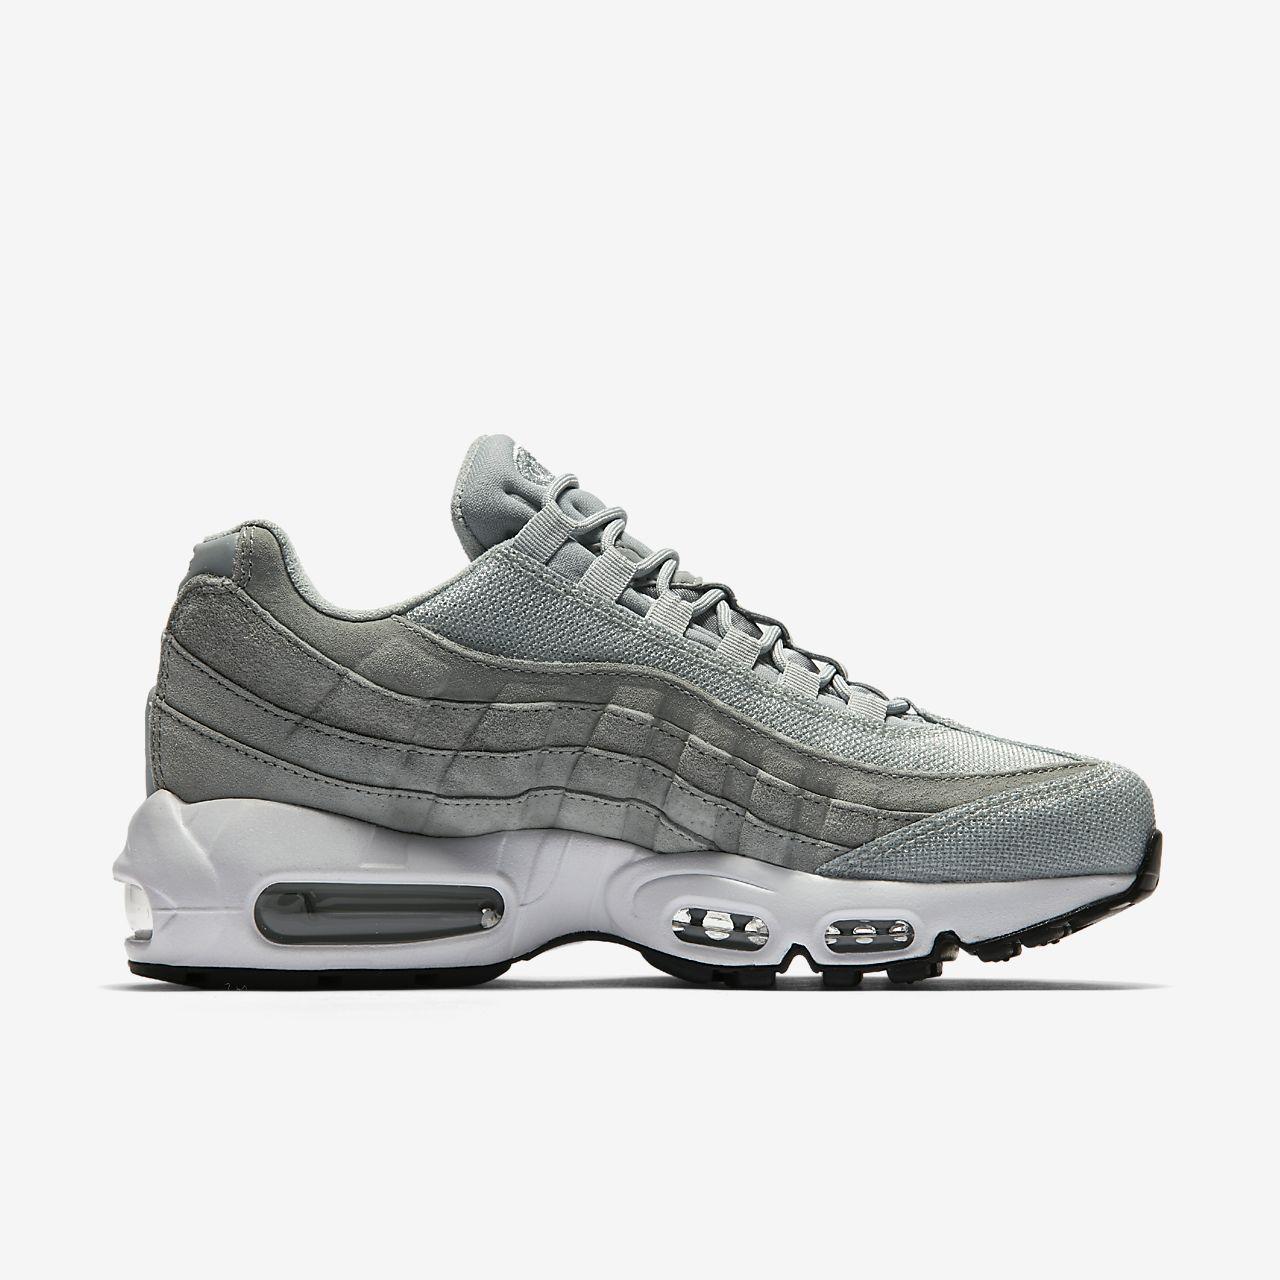 Nike Women's Air Max 95 Premium Sneaker 92UjeJGW